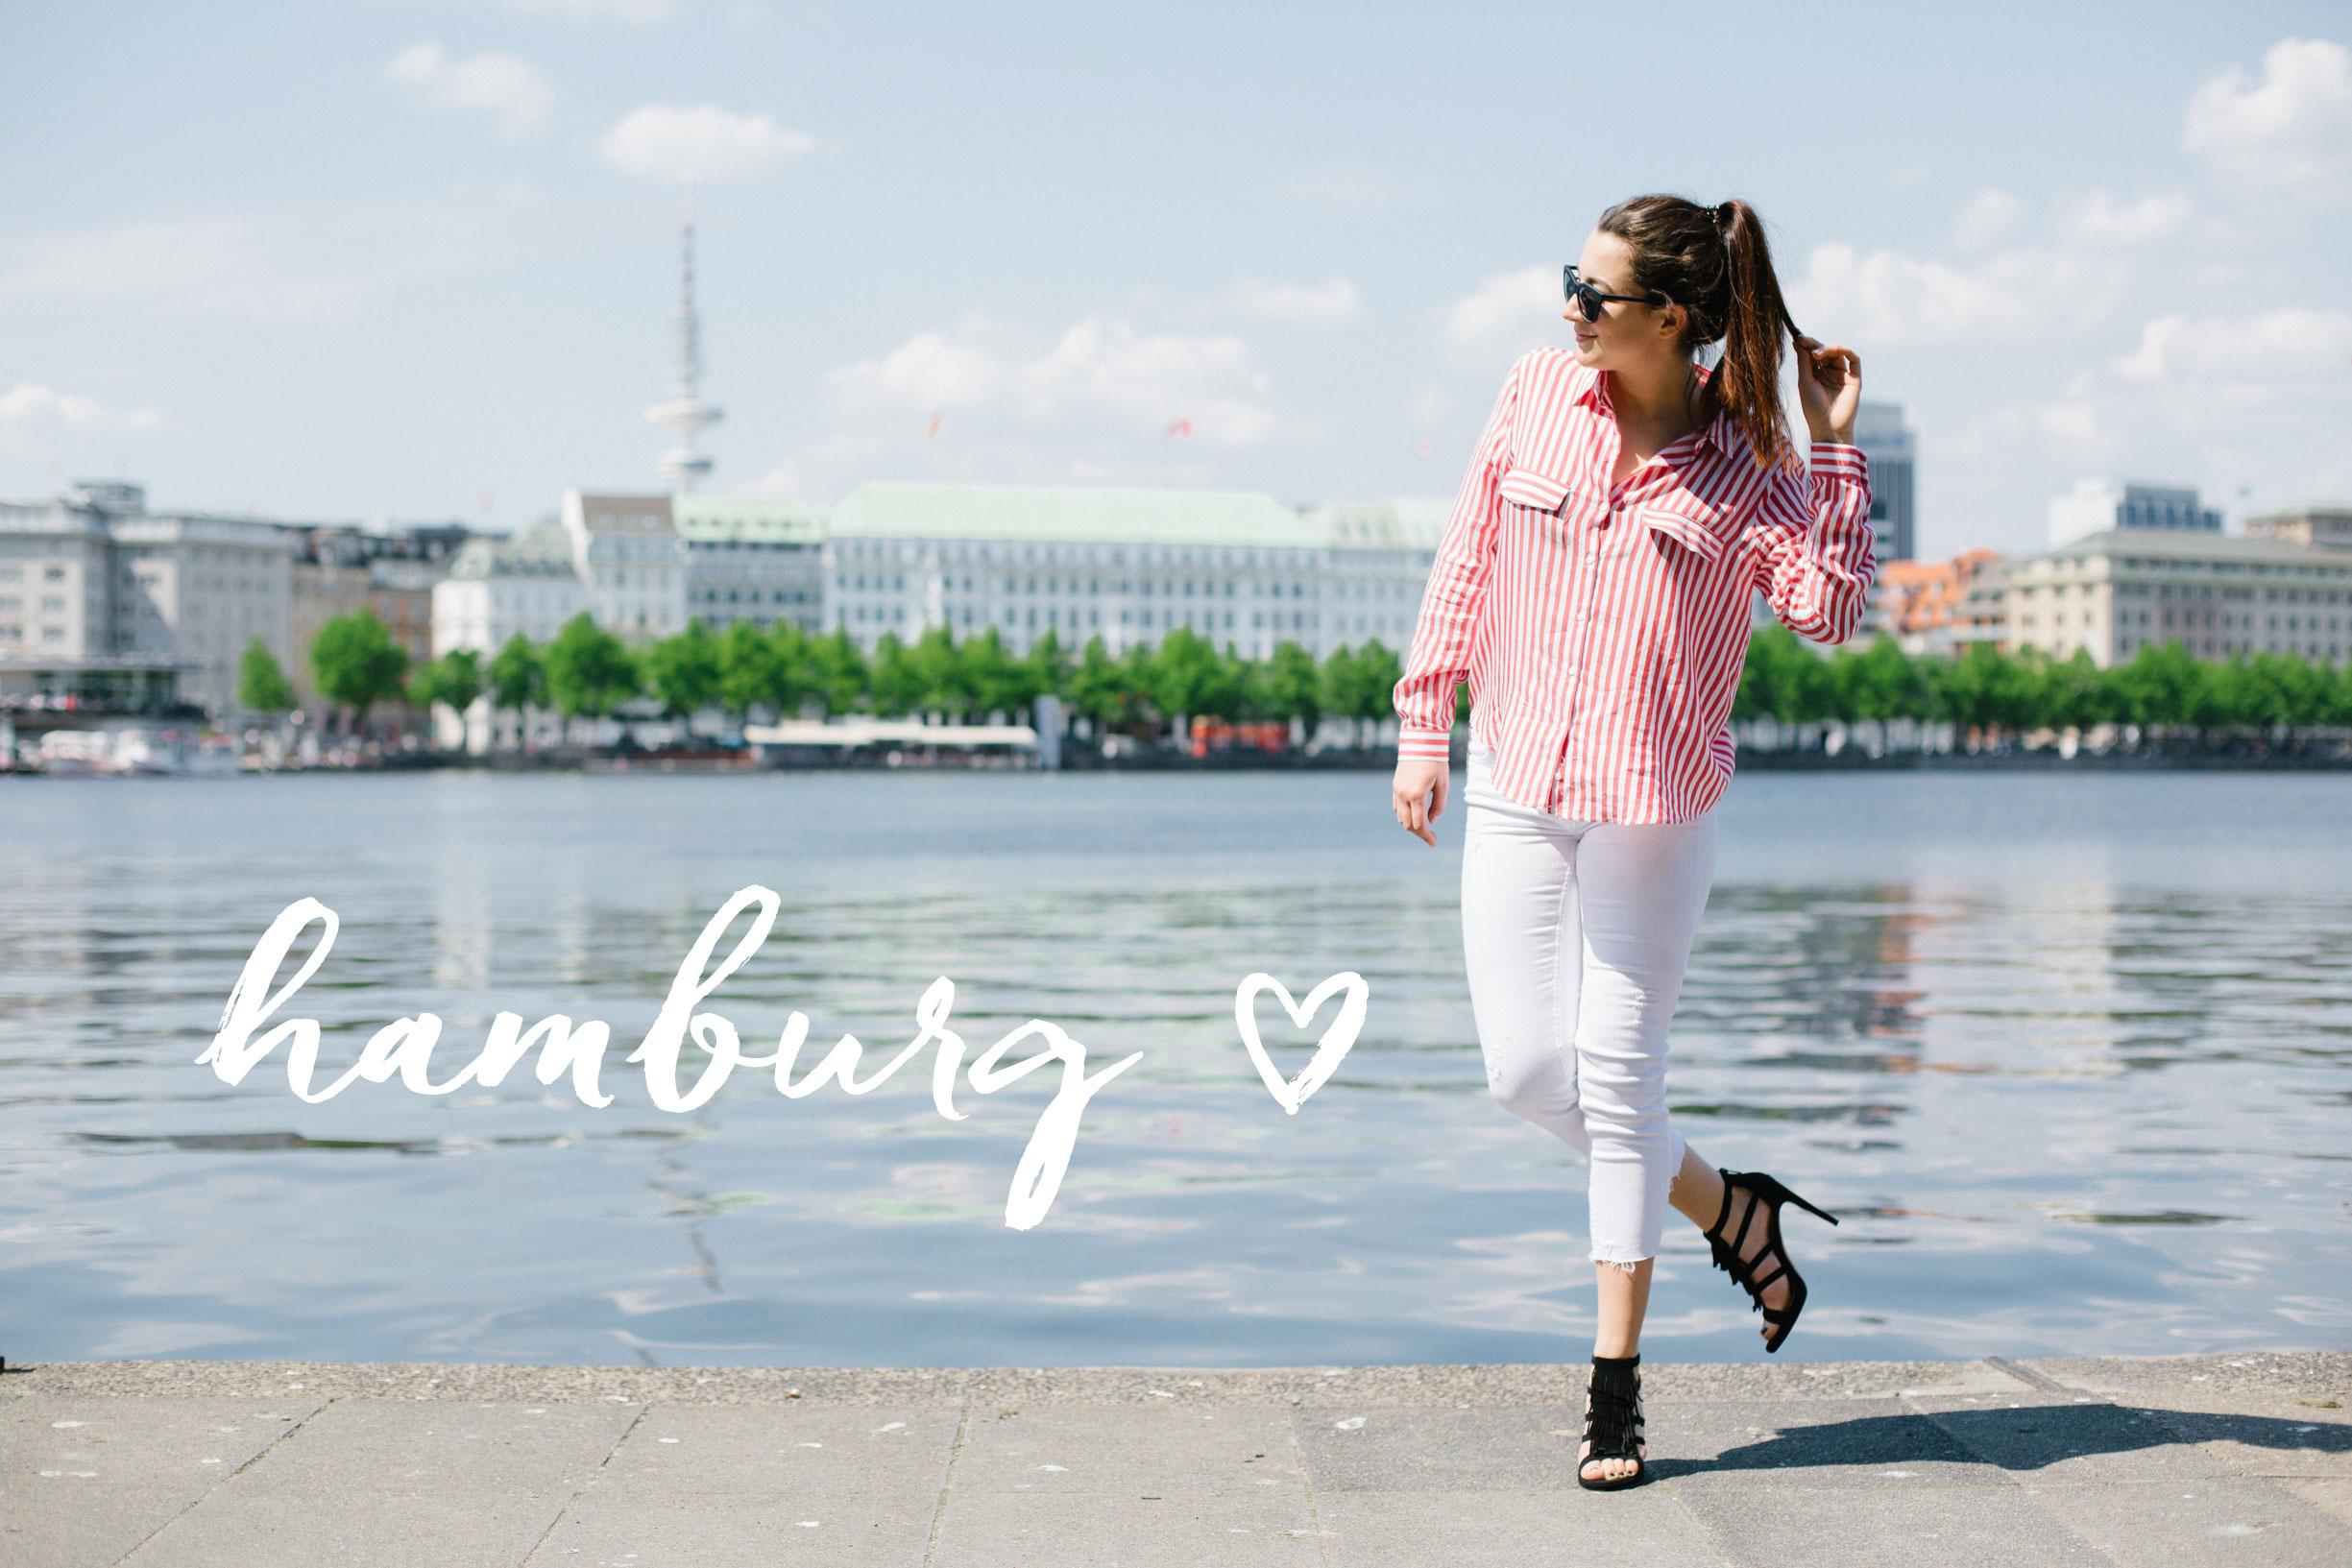 Hamburgsofteis